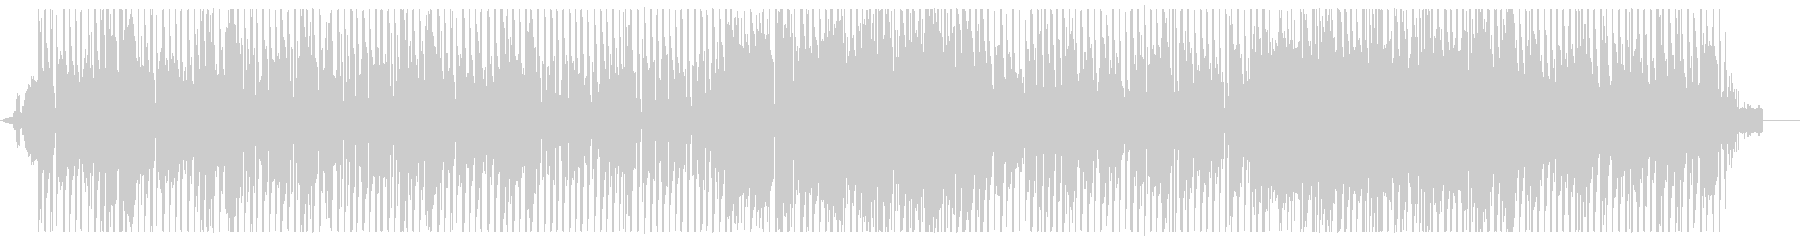 coma whiteの未再生の波形